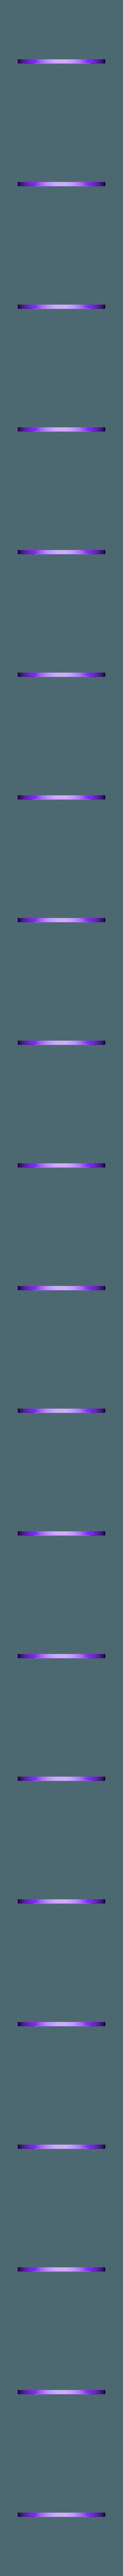 raptors_white.STL Download free STL file Minimal Multi-color NBA coasters • 3D print object, MosaicManufacturing